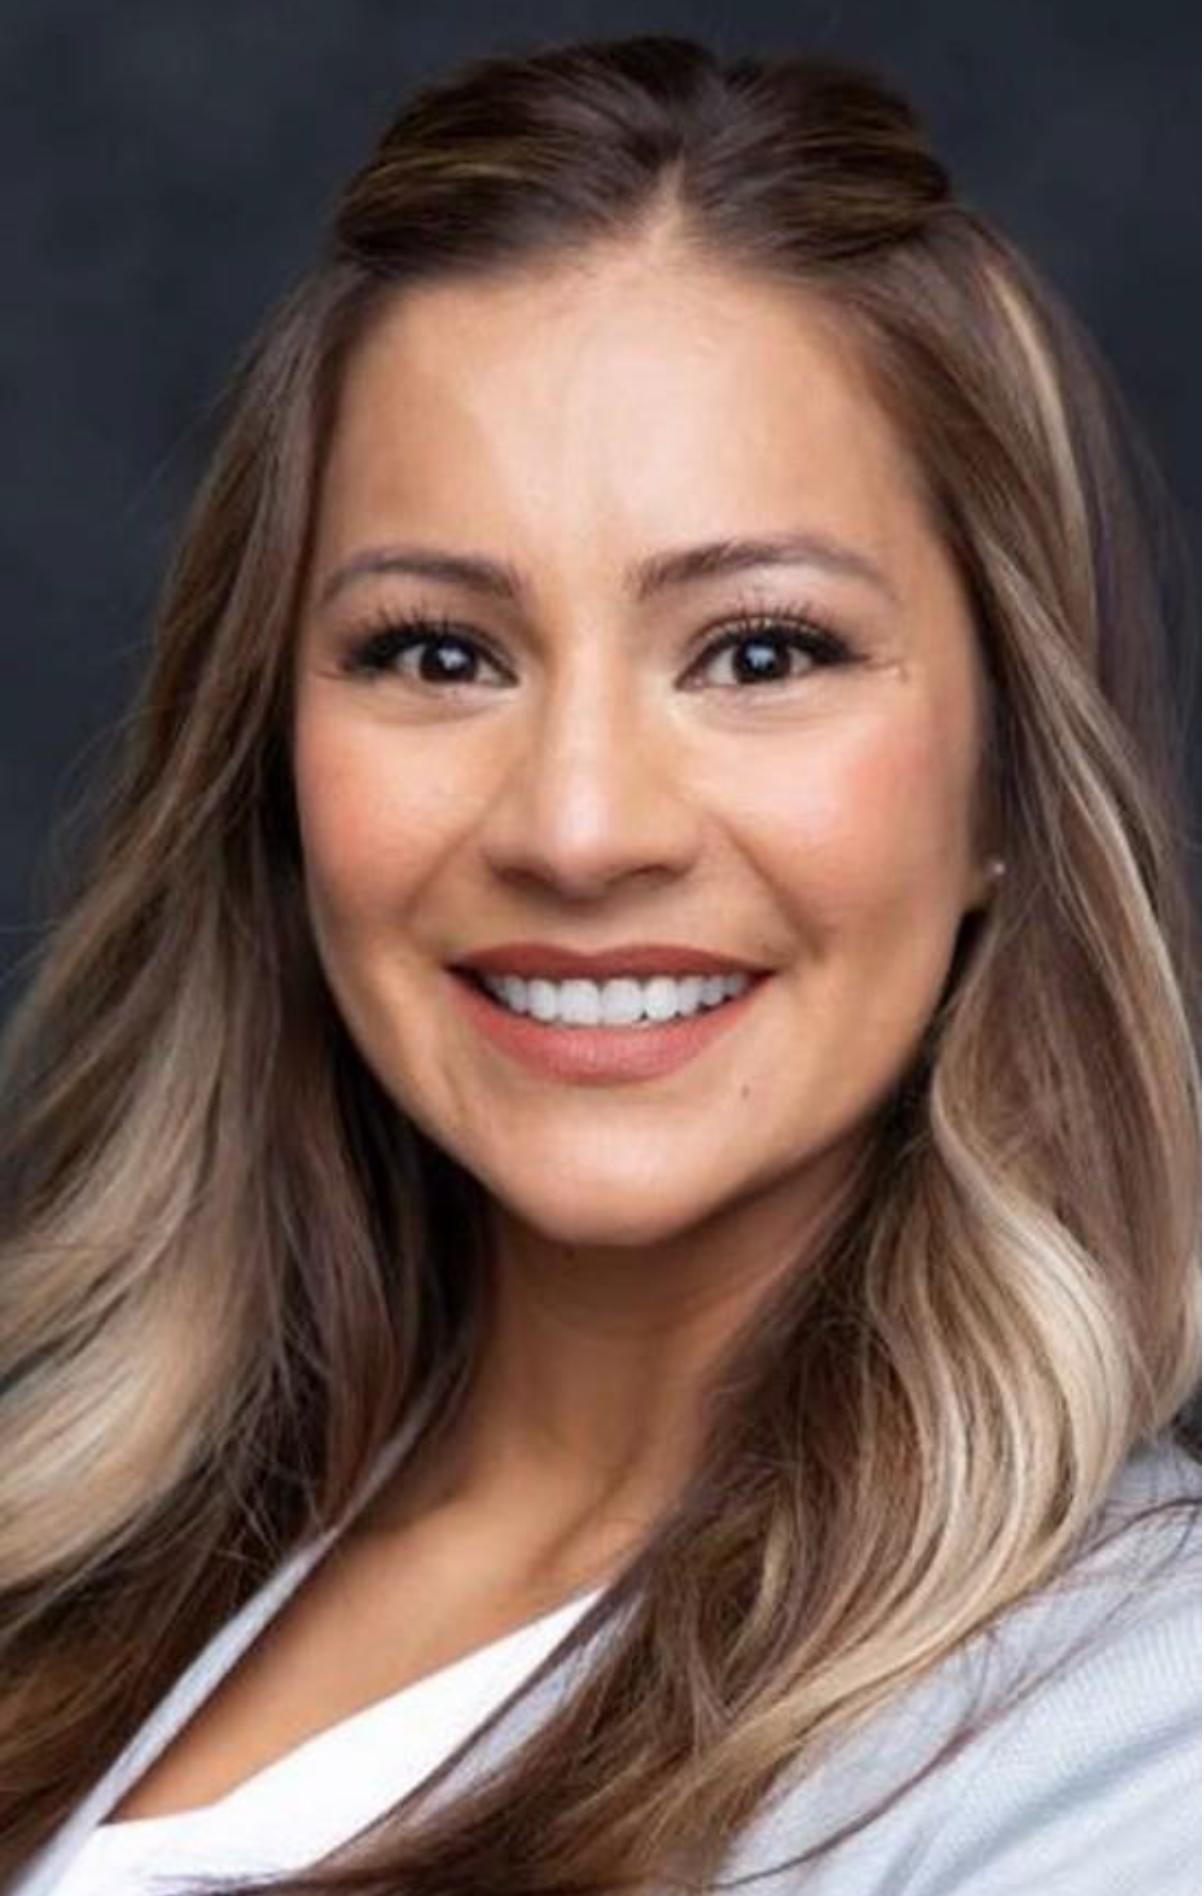 B. Abigail Tarango – UMC Foundation & El Paso Children's Hospital Foundation